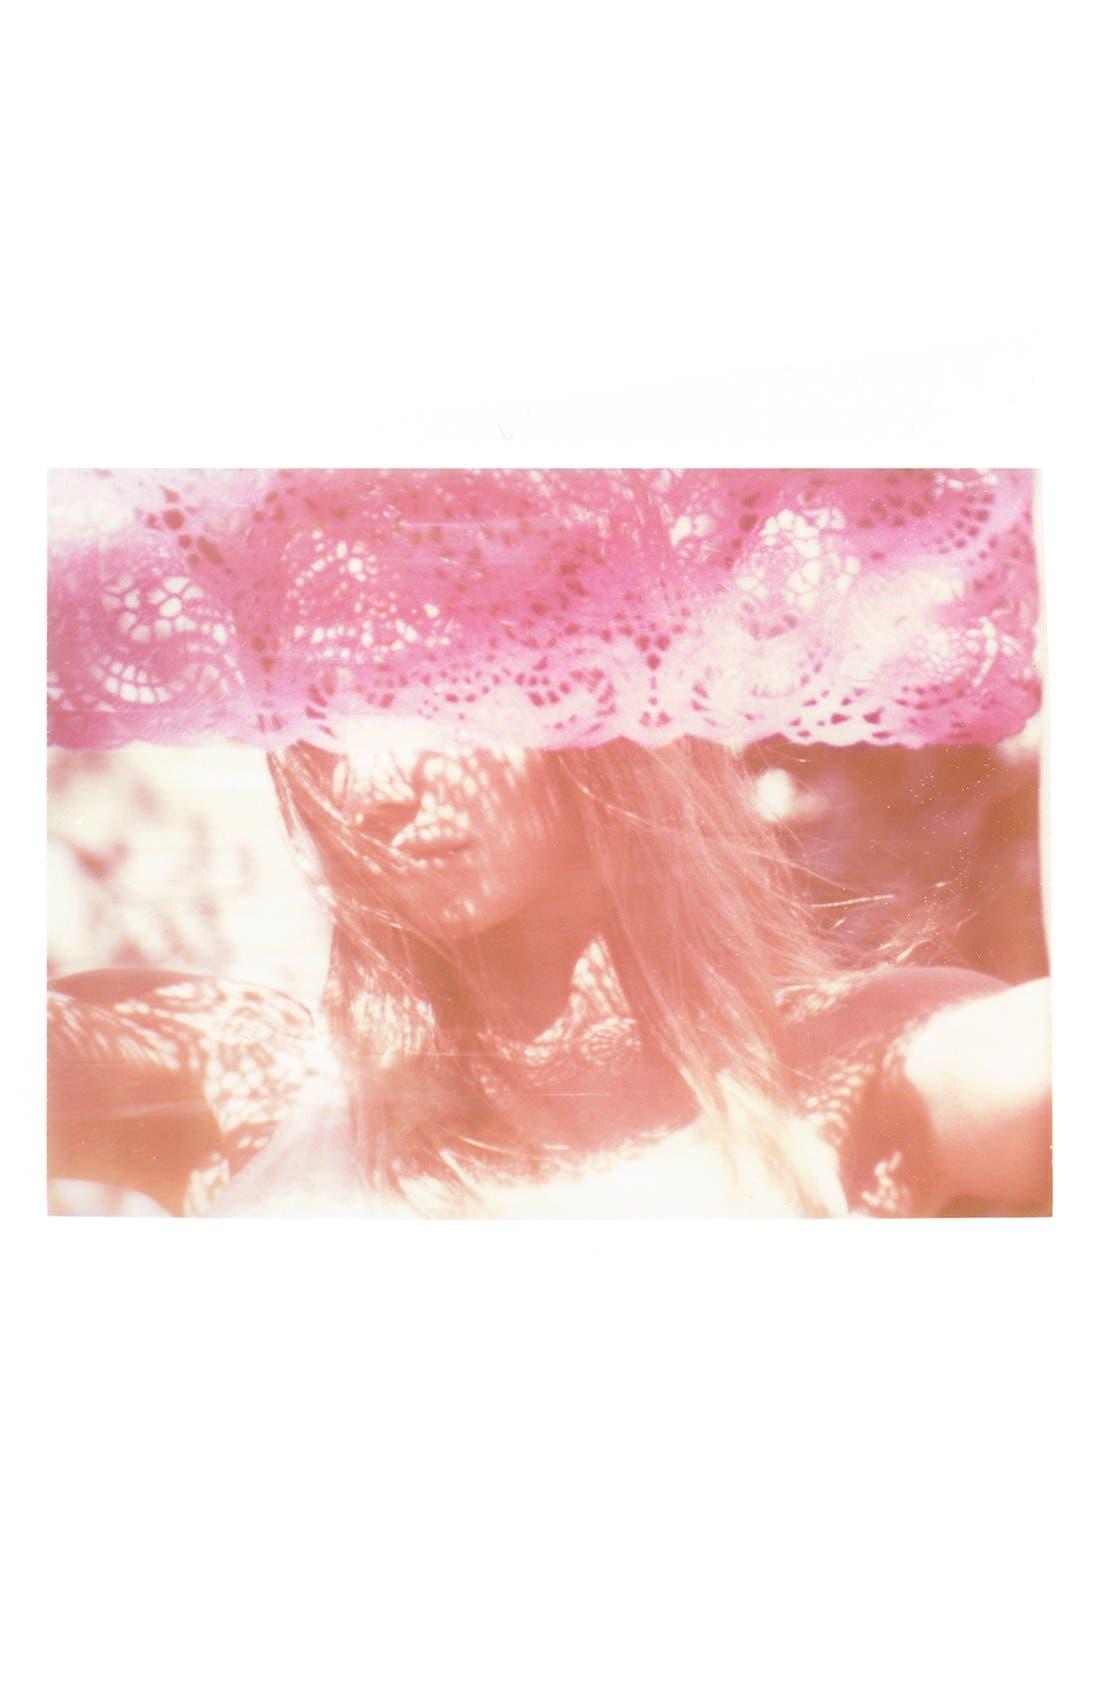 Alternate Image 1 Selected - She Hit Pause Studios 'Pink Shadows' Wall Art